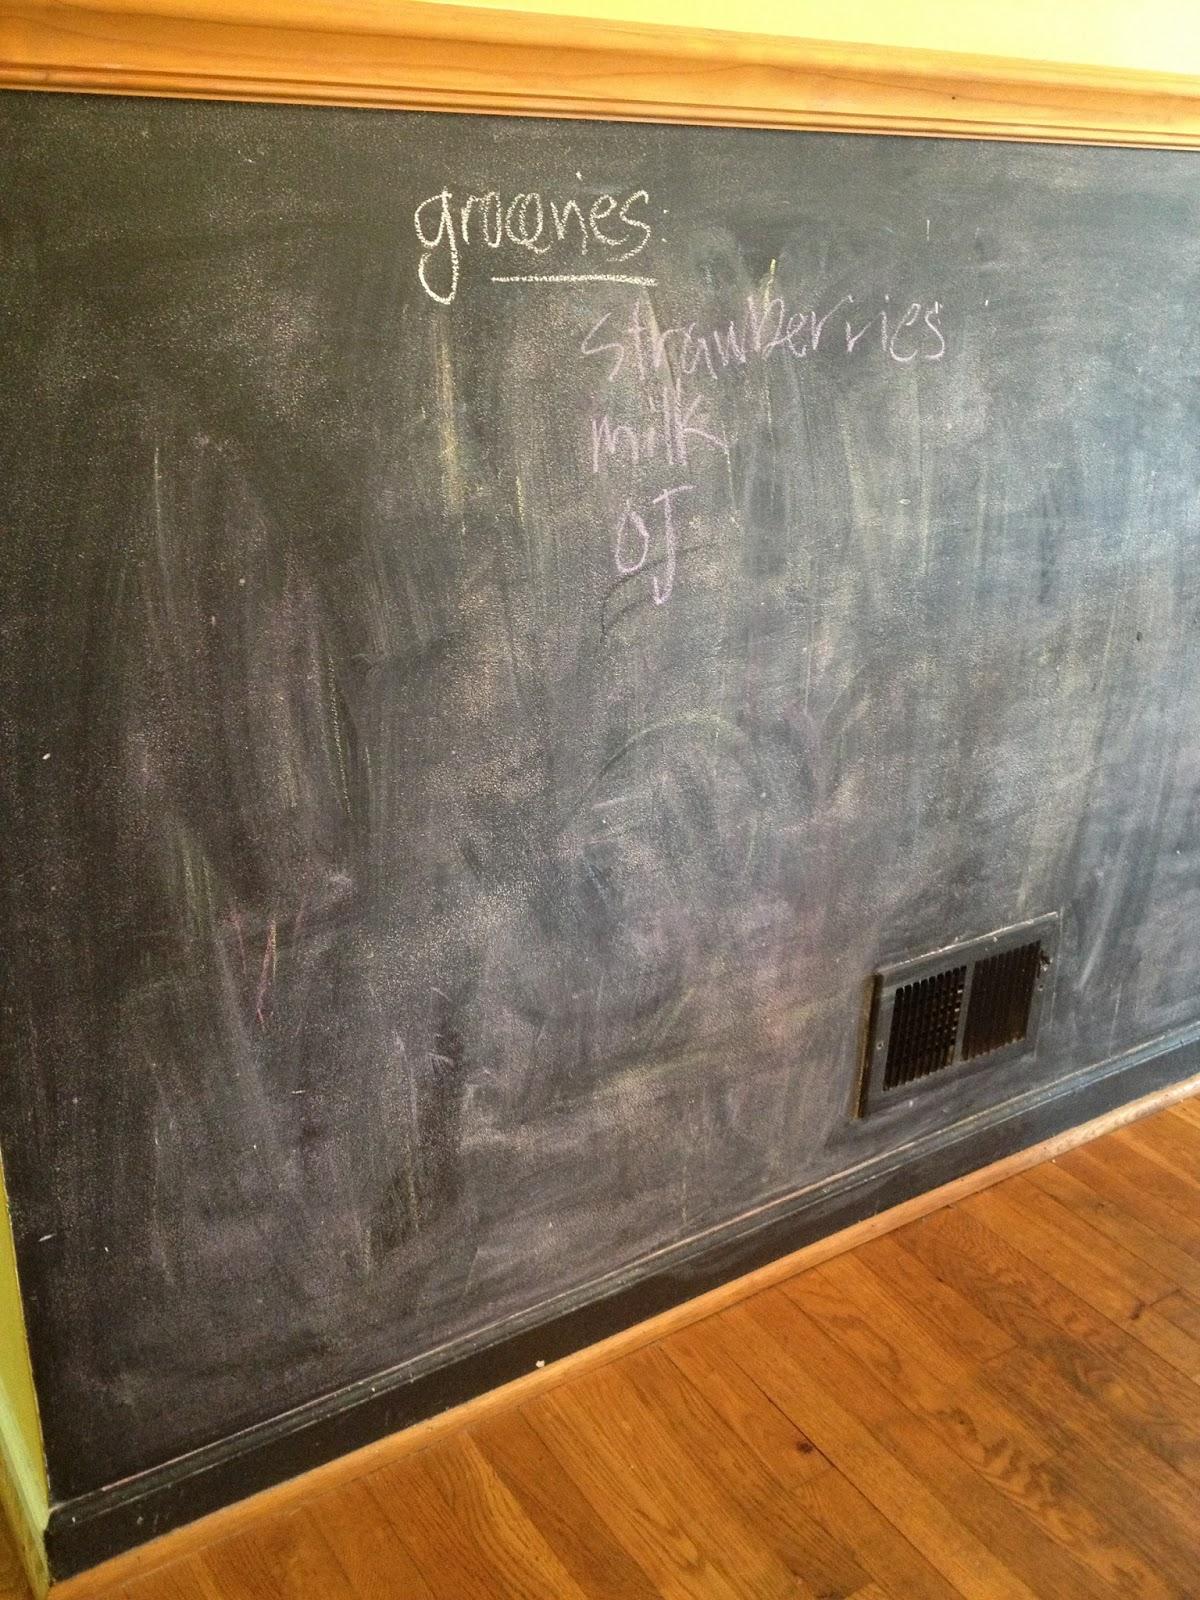 1970 Dogwood Street Chalk Paint Vs Chalkboard Paint